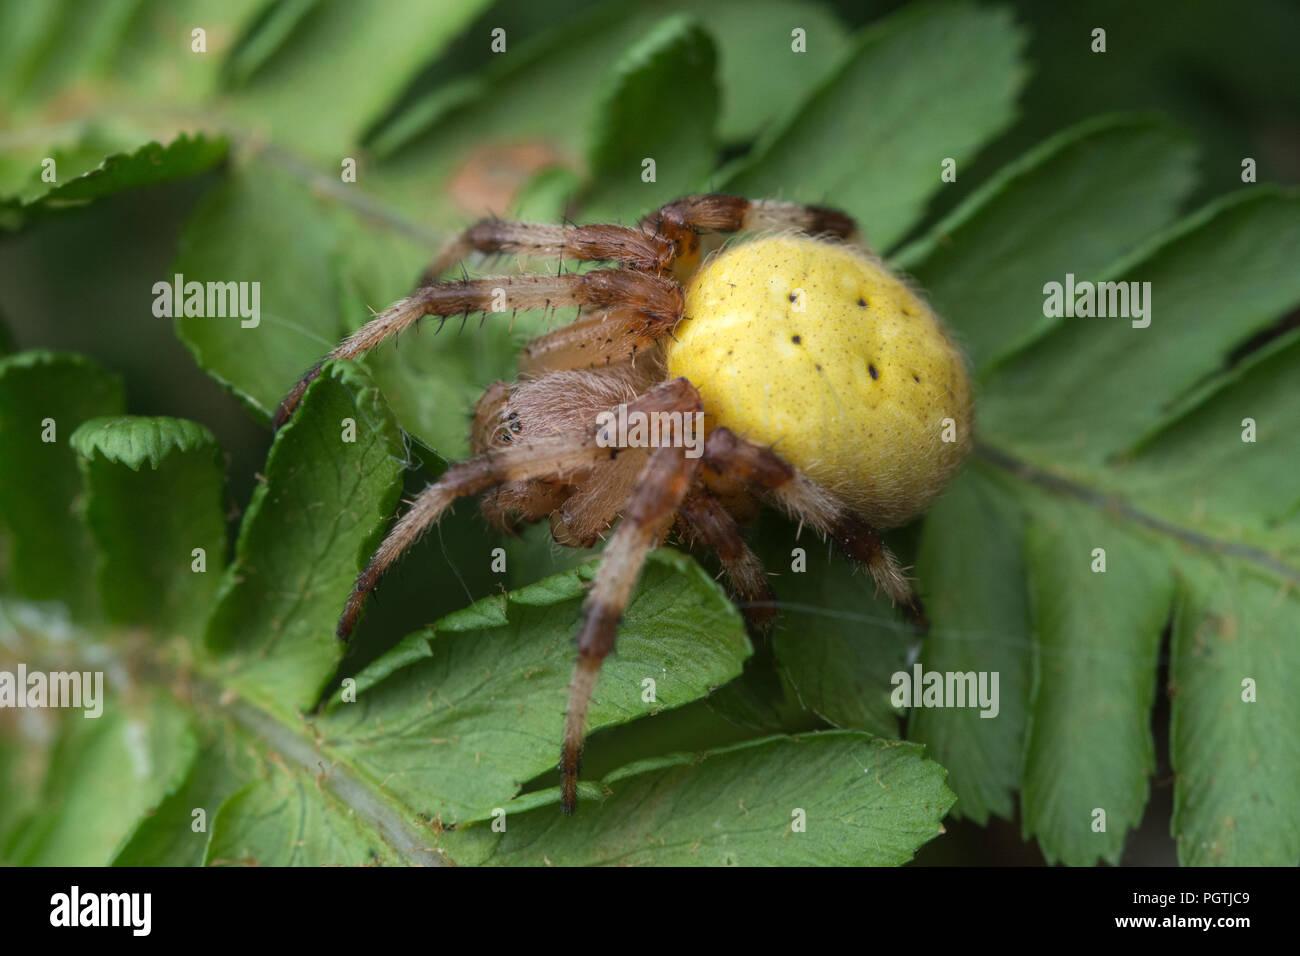 Colourful four-spotted orb weaver spider (Araneus quadratus) male on bracken in Surrey, UK - Stock Image